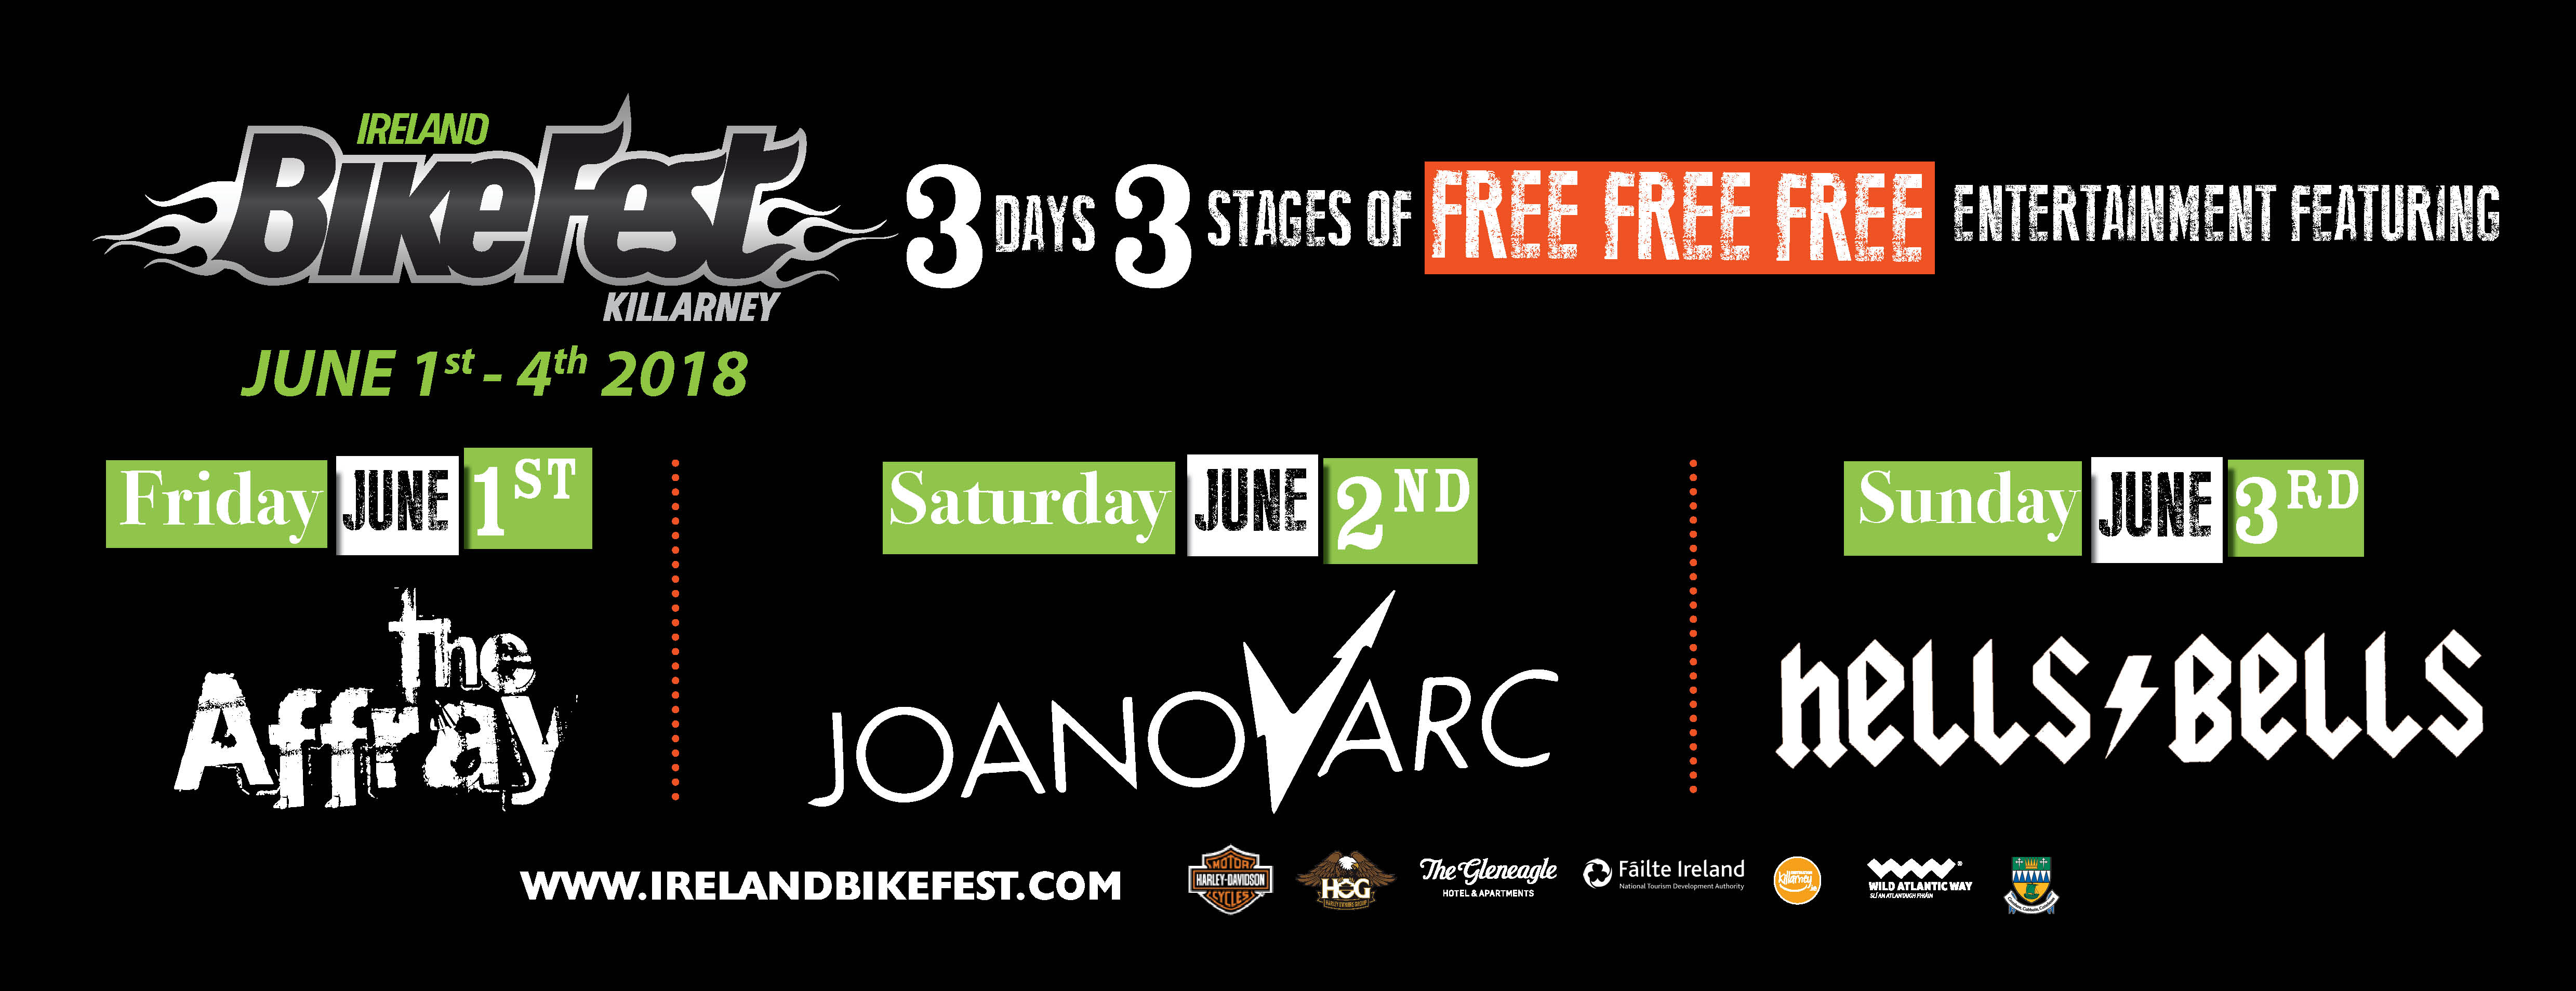 Ireland Bikefest Killarney Entertainment 2018